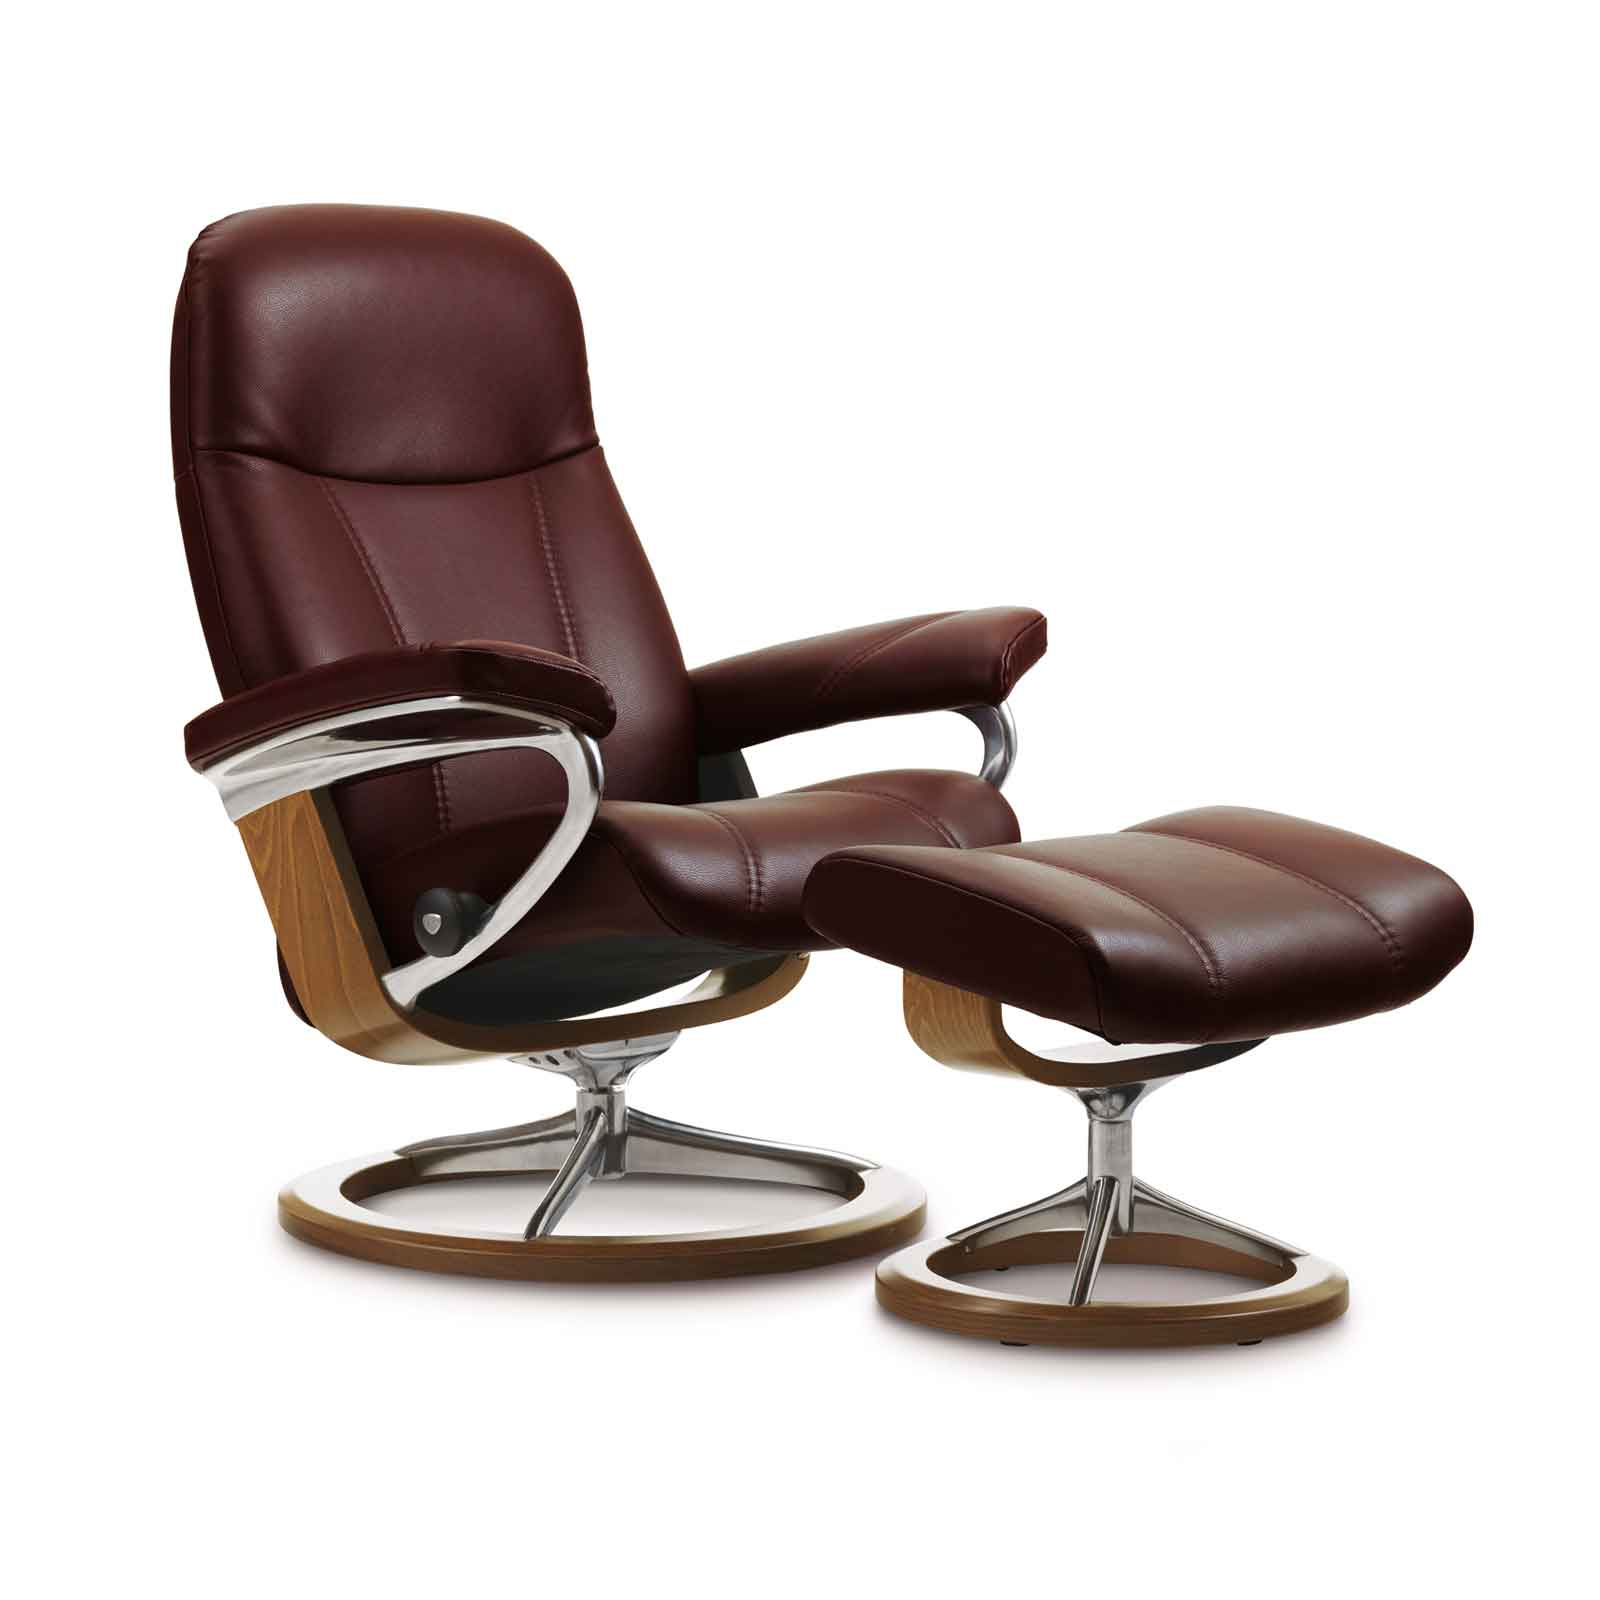 Stressless Heimkino Preis Stressless Sessel Reno Jetzt Entdecken